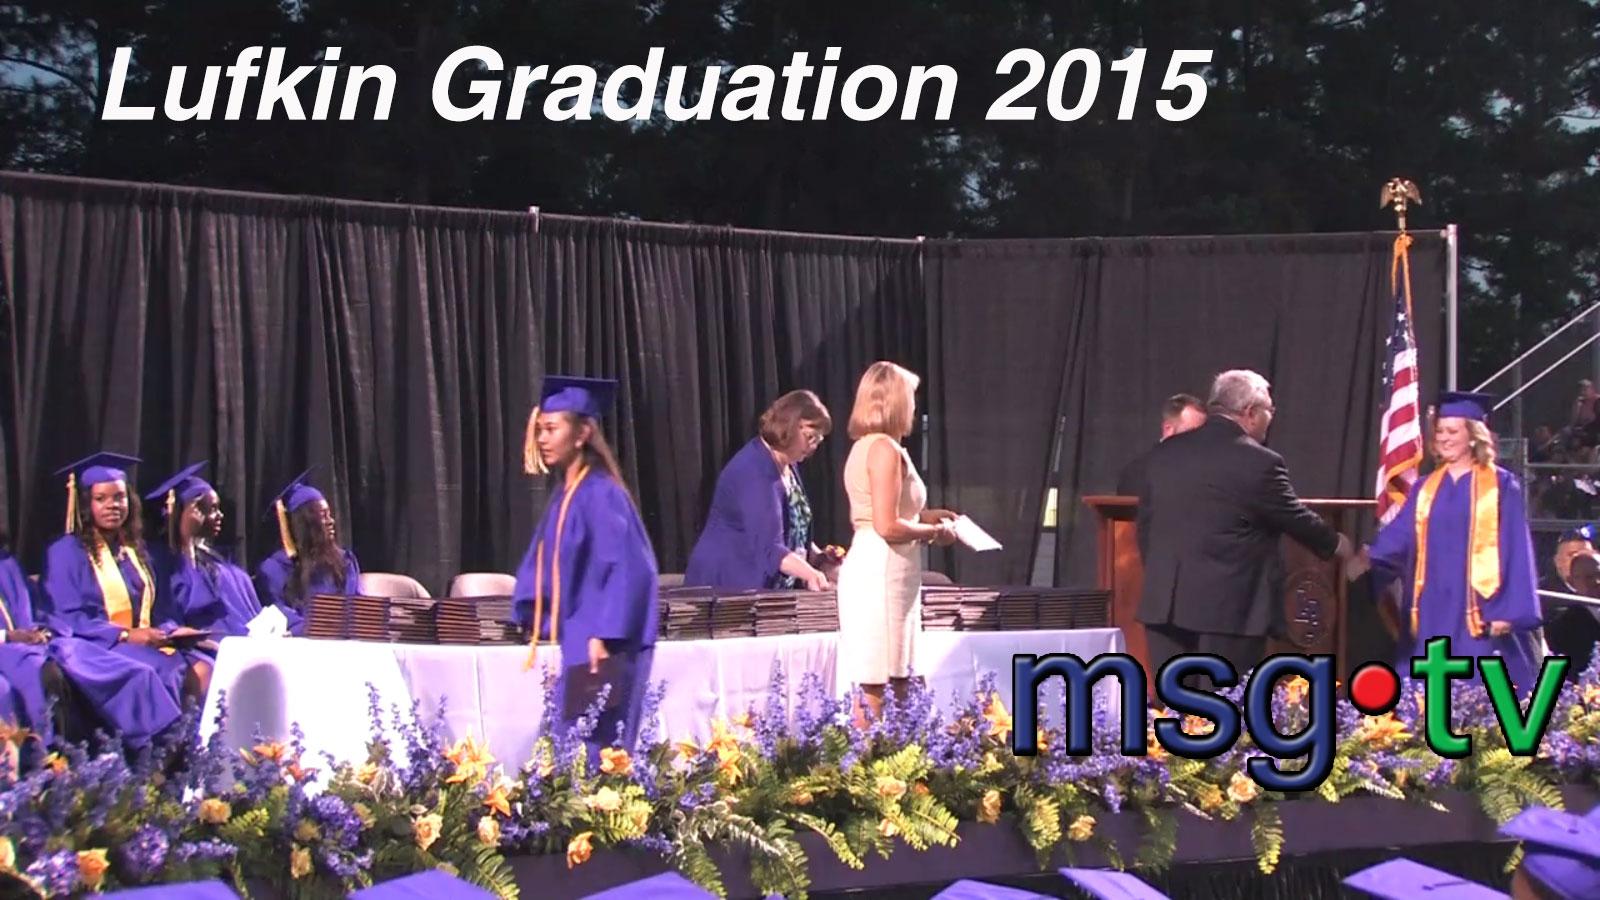 Lufkin Graduation 2015